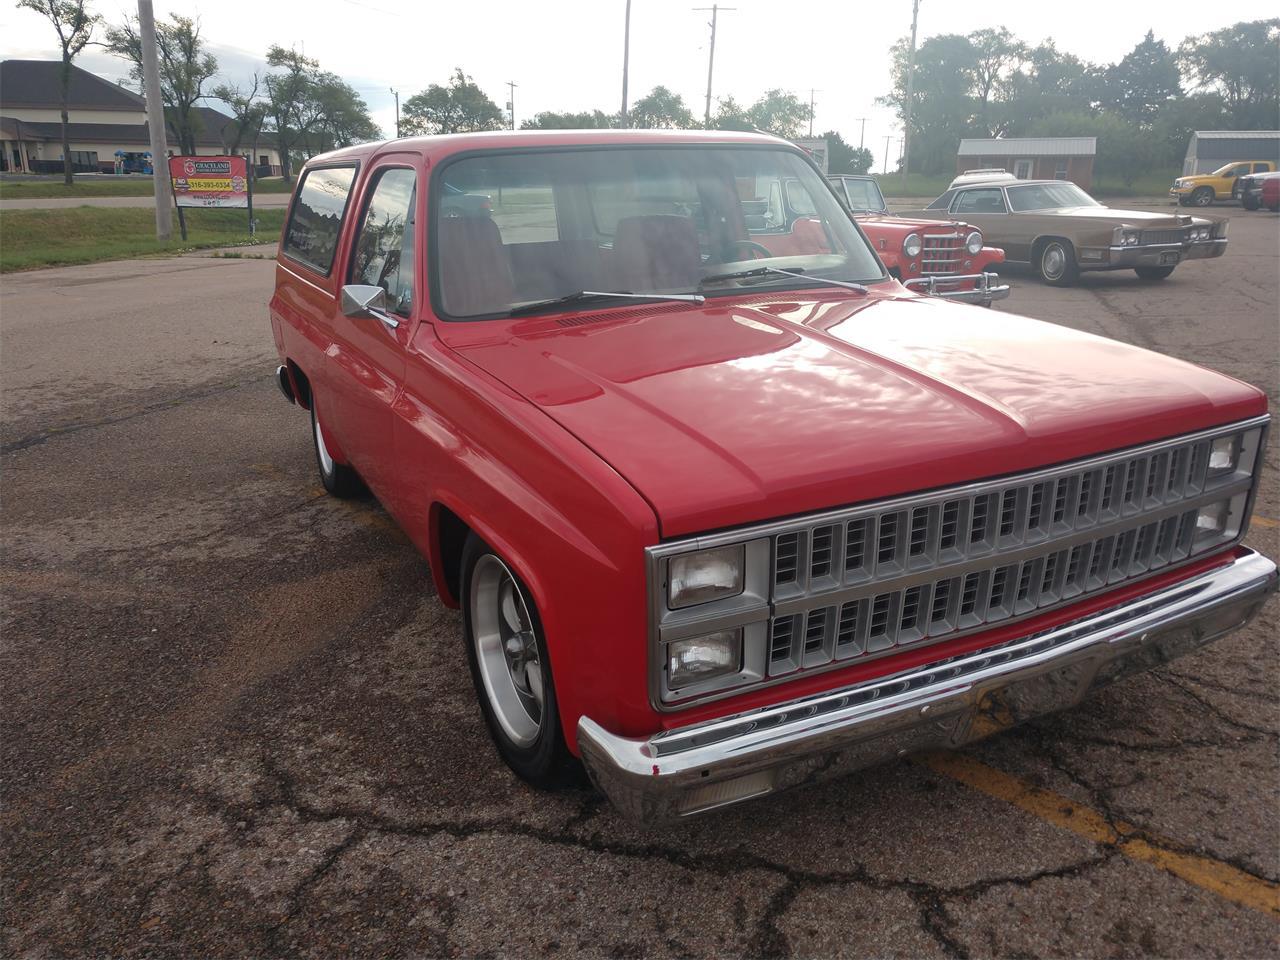 1981 Chevrolet Blazer (CC-1364905) for sale in Benton, Kansas